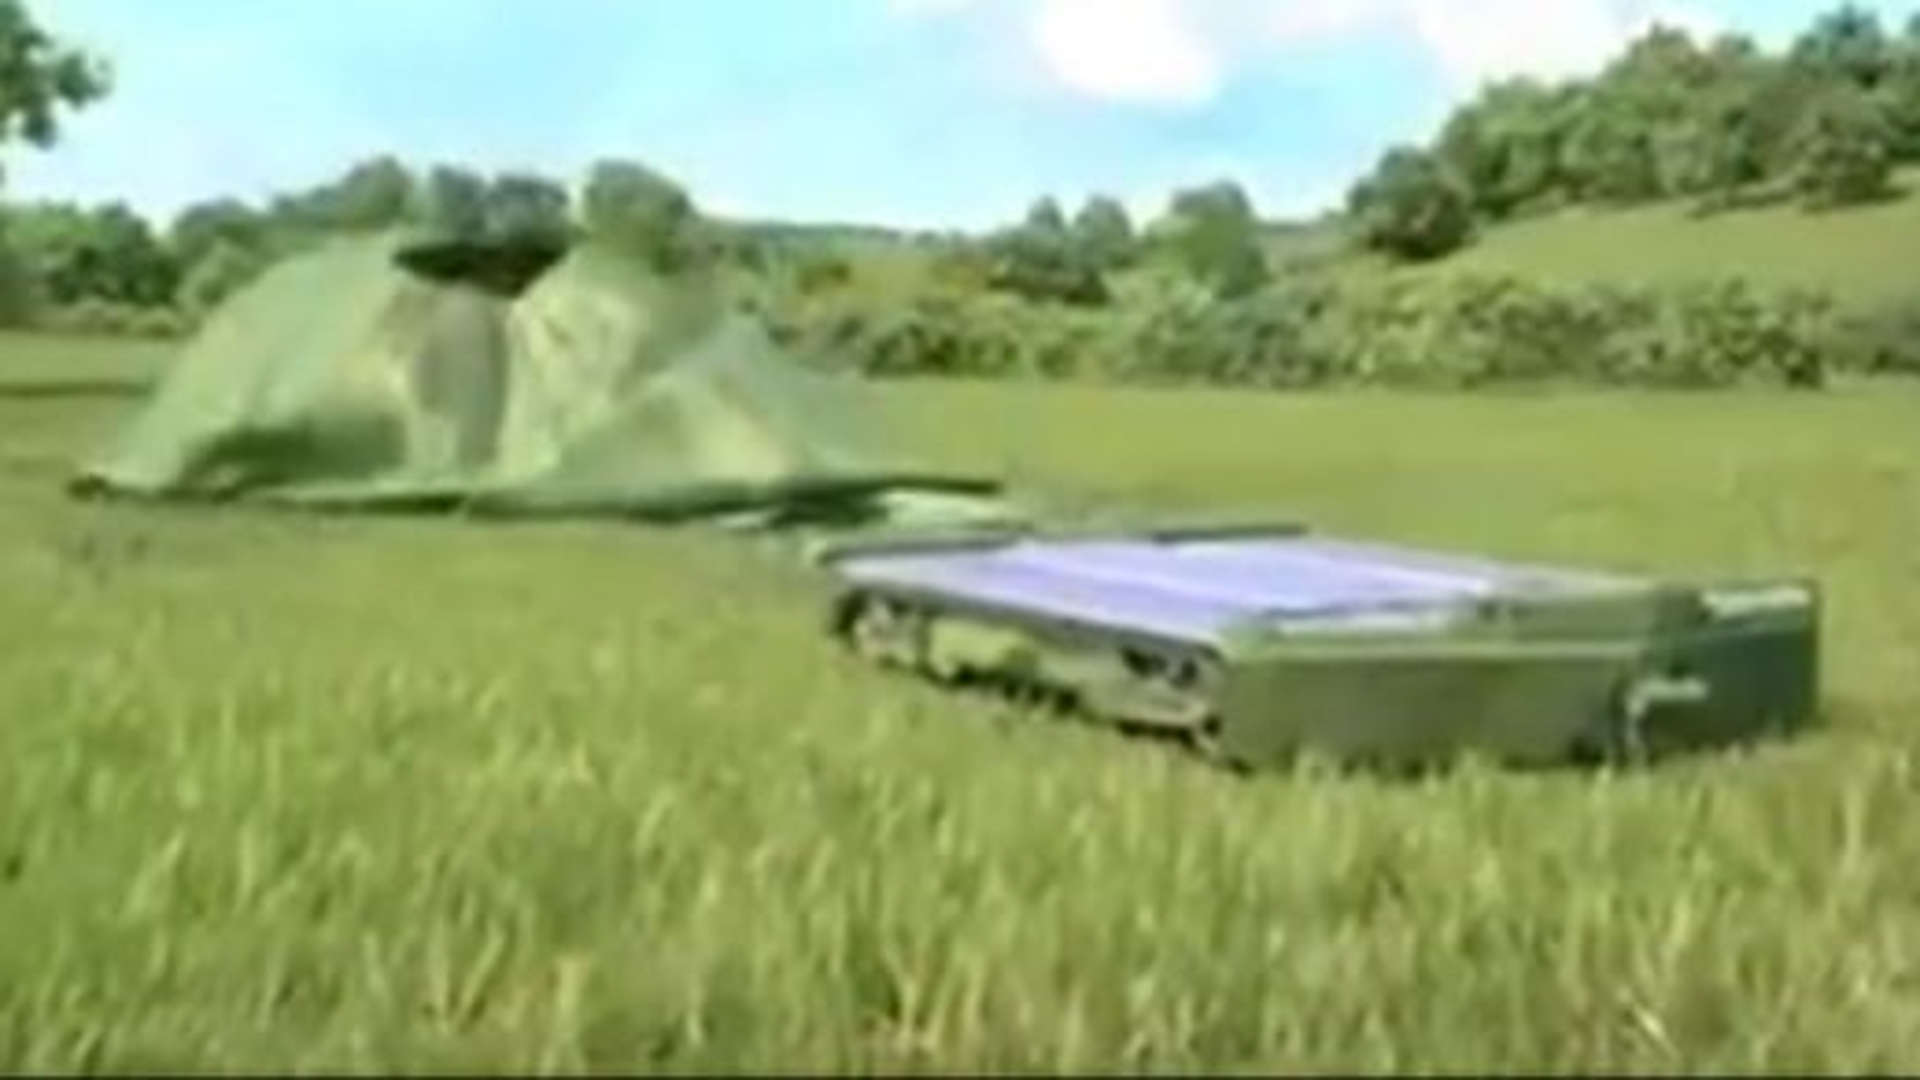 انیمیشن جنگ افزار | تگ